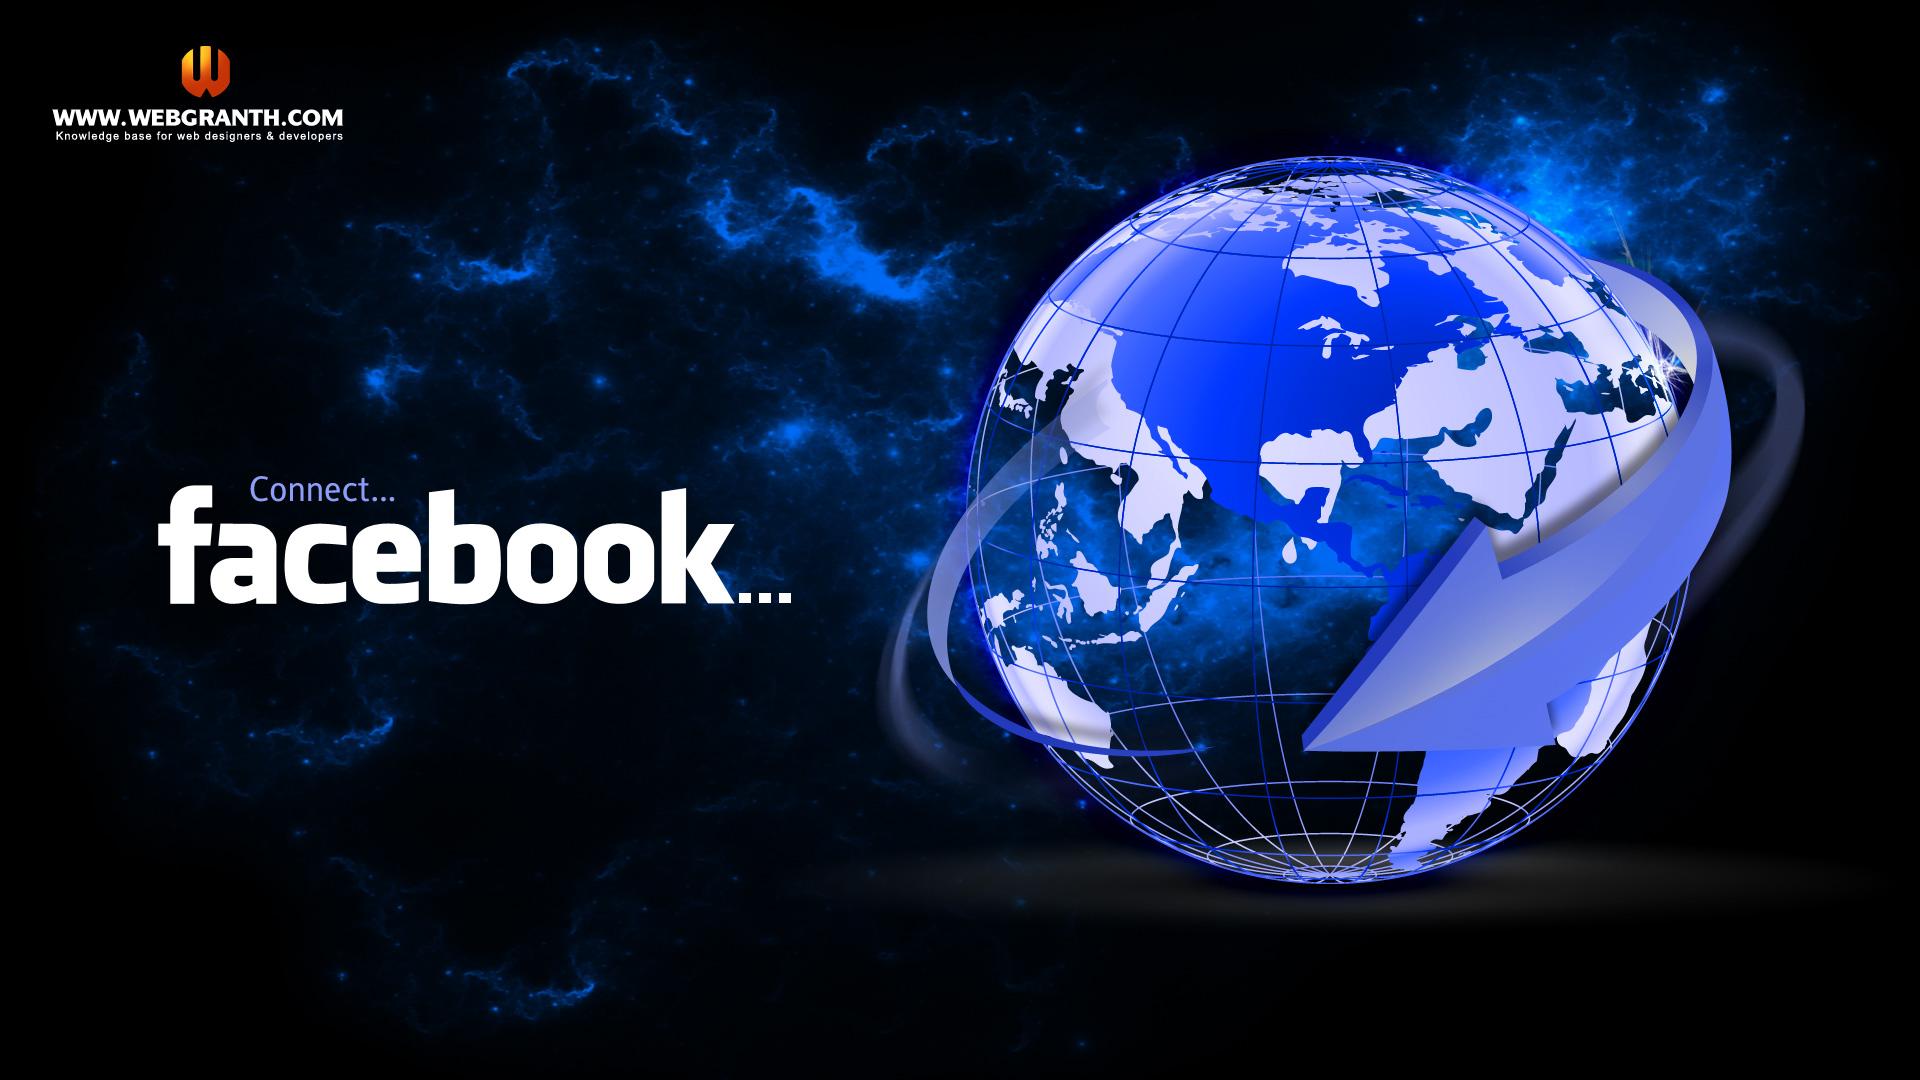 Facebook Images - Pixabay - Download Free Pictures